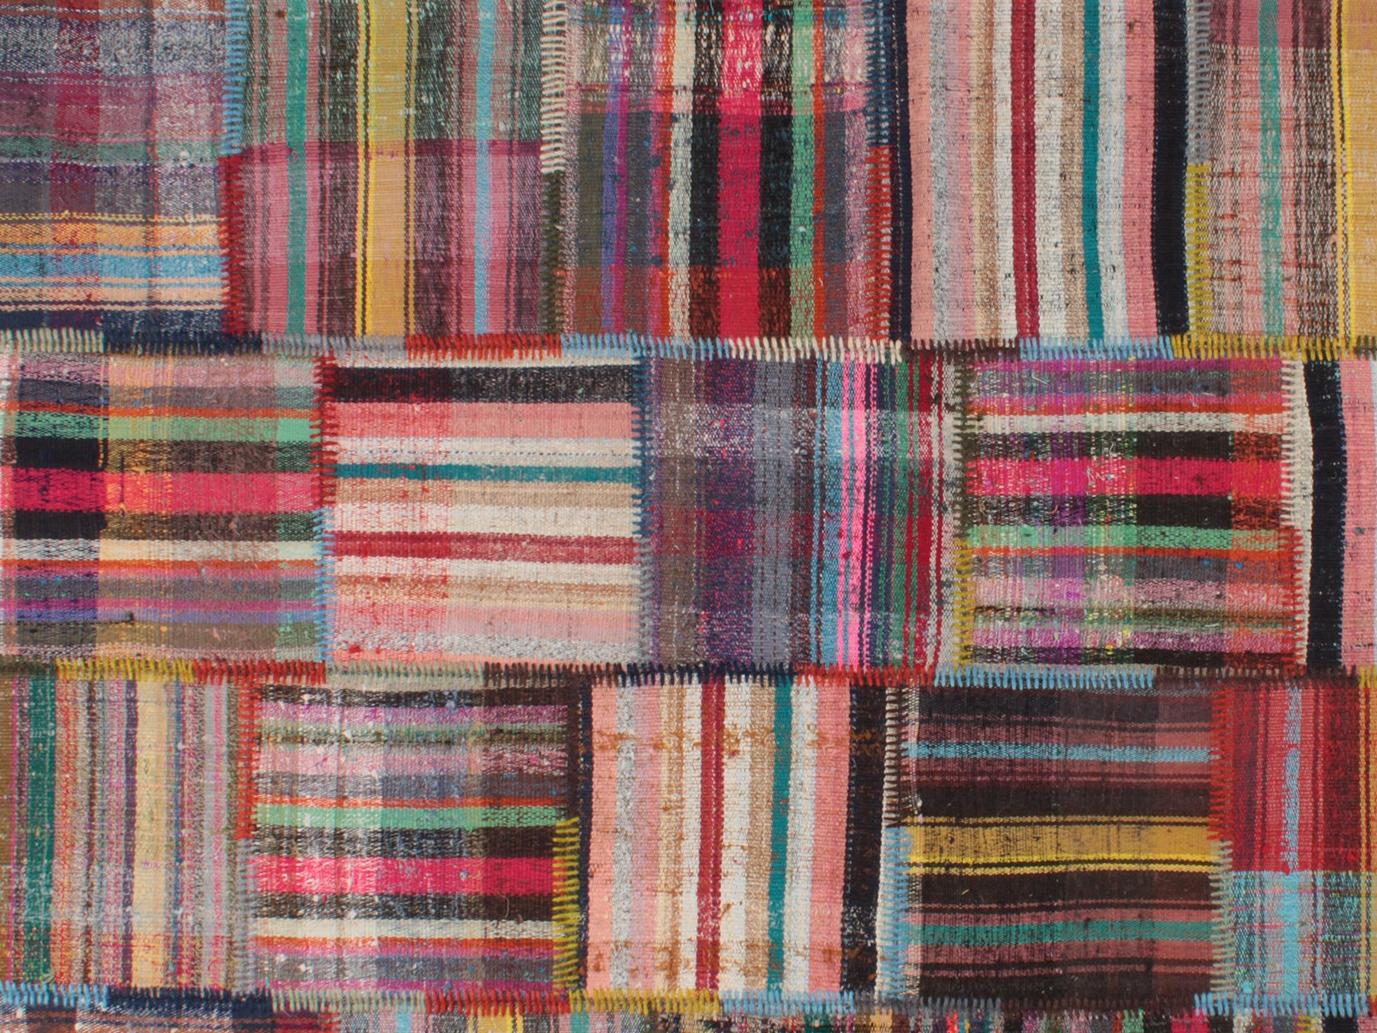 Zakatala tapis patchwork